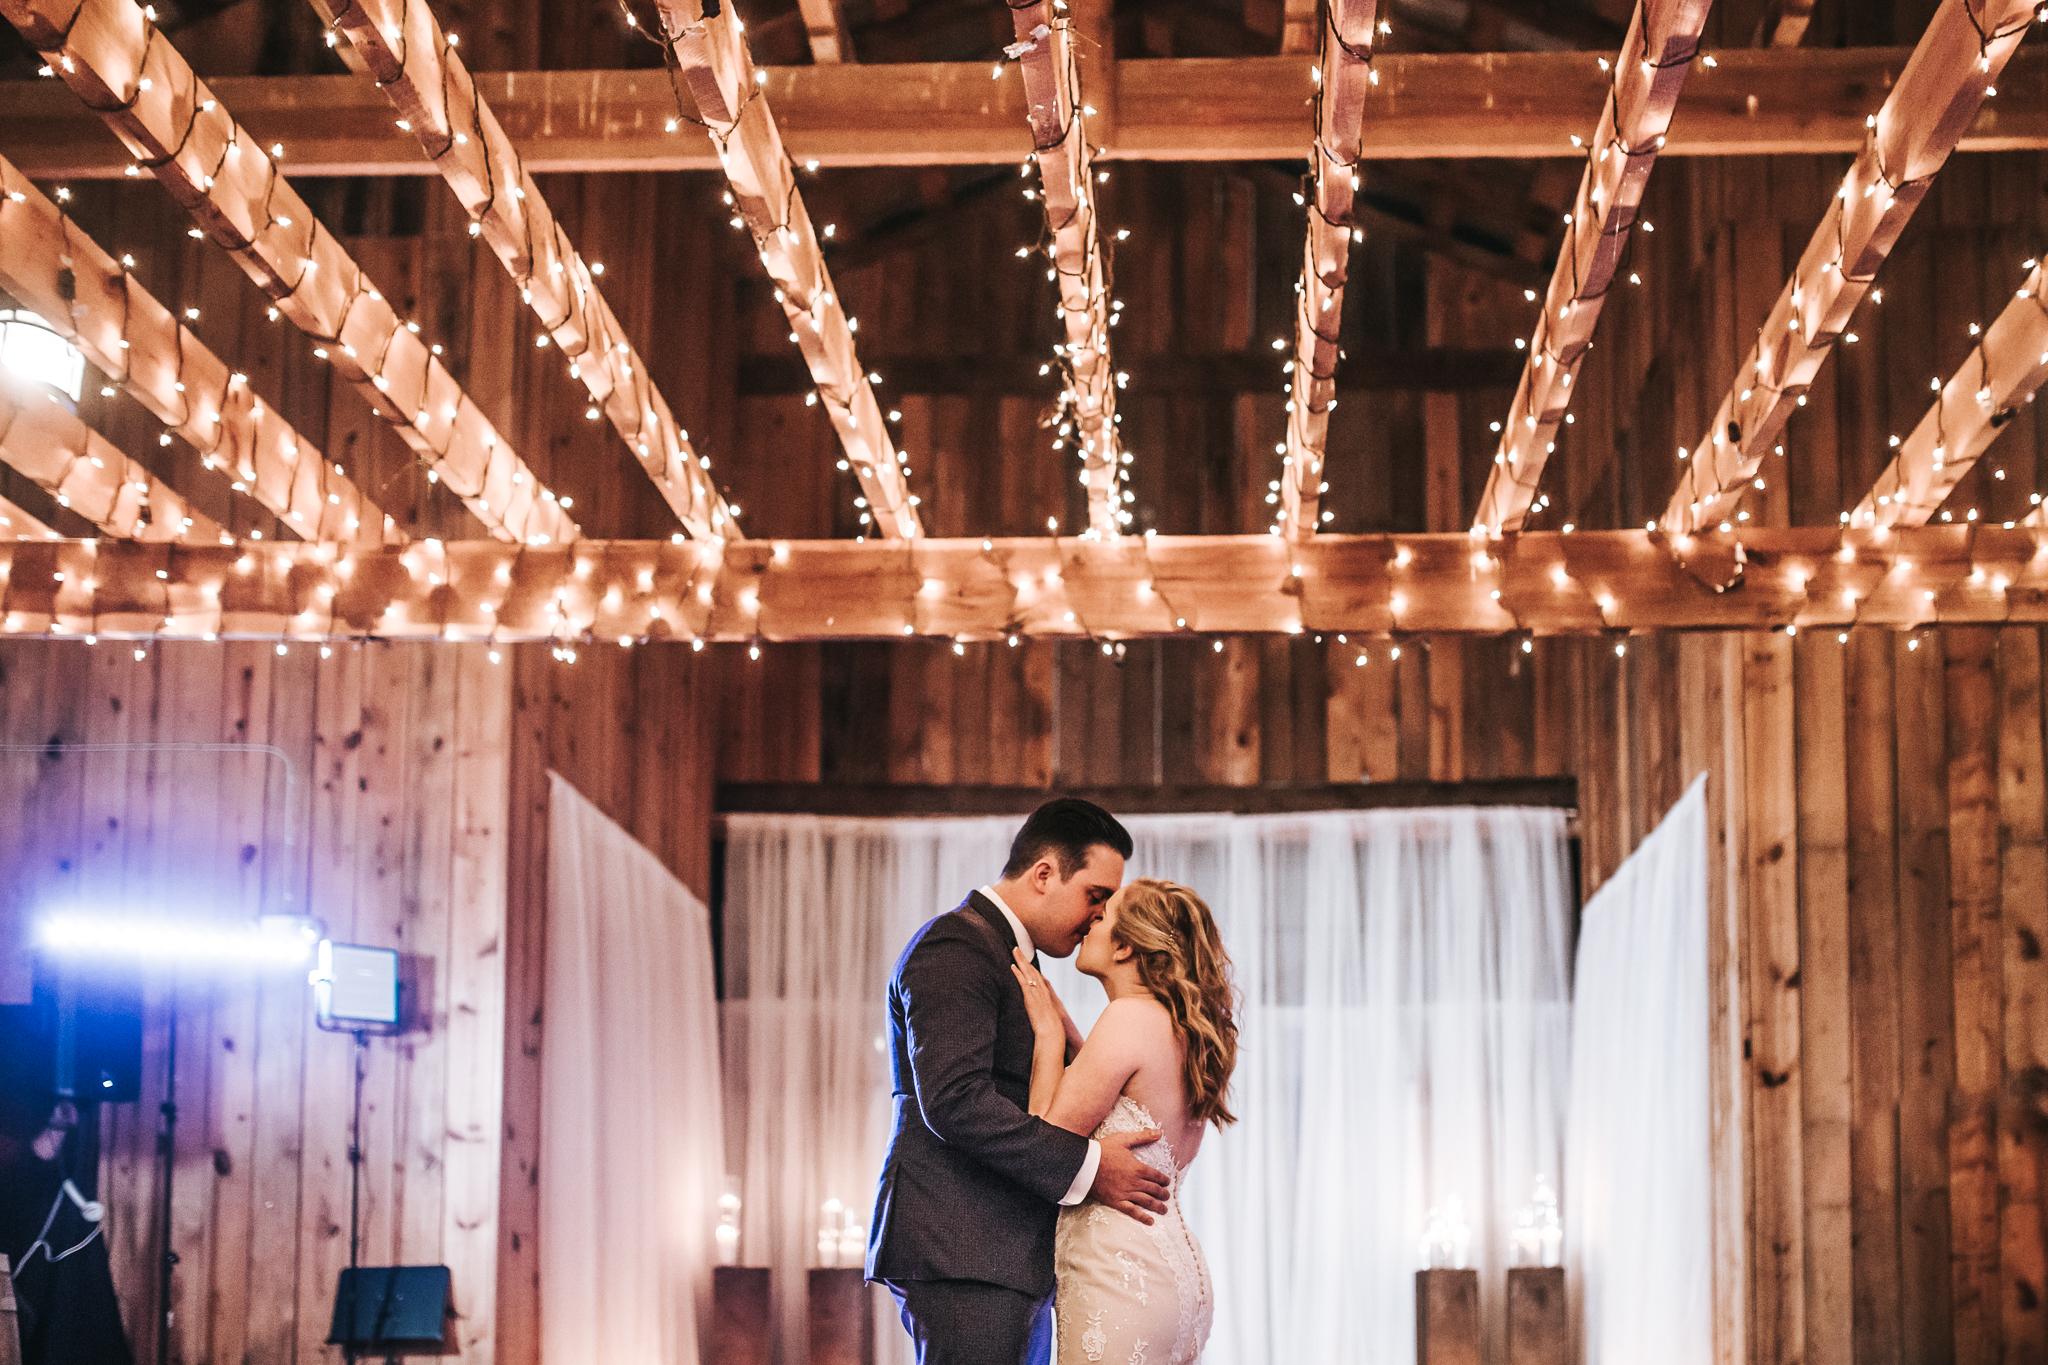 0167 Ariana Jordan Photo - Cameron & Lauren's Wedding at Talon Winery  7659.jpg